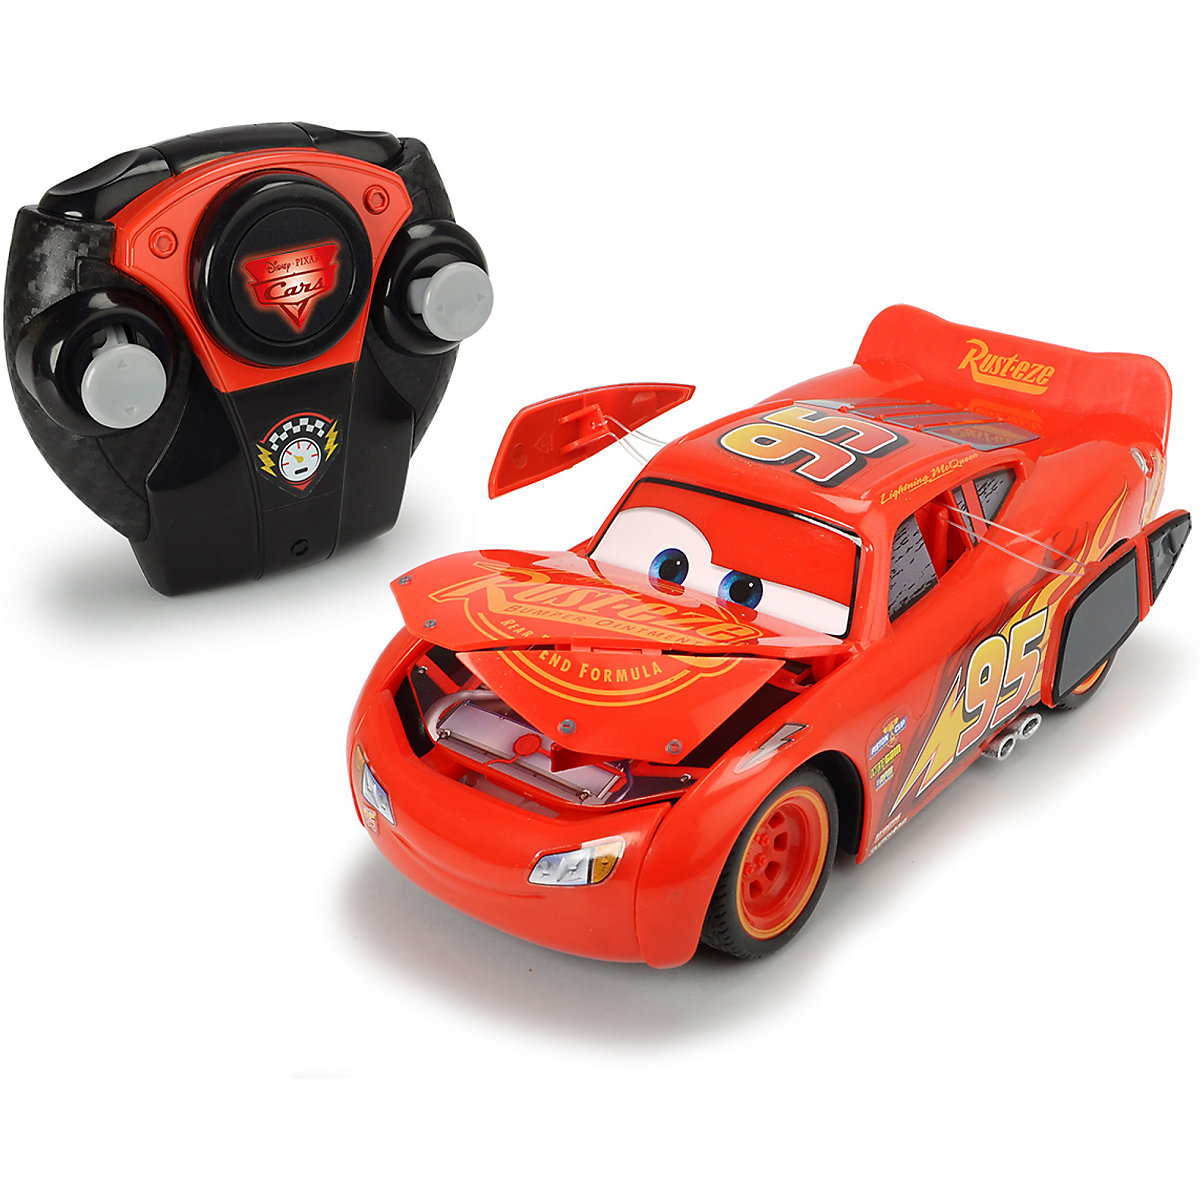 rc cars 3 lightning mcqueen crazy crash disney cars mytoys. Black Bedroom Furniture Sets. Home Design Ideas